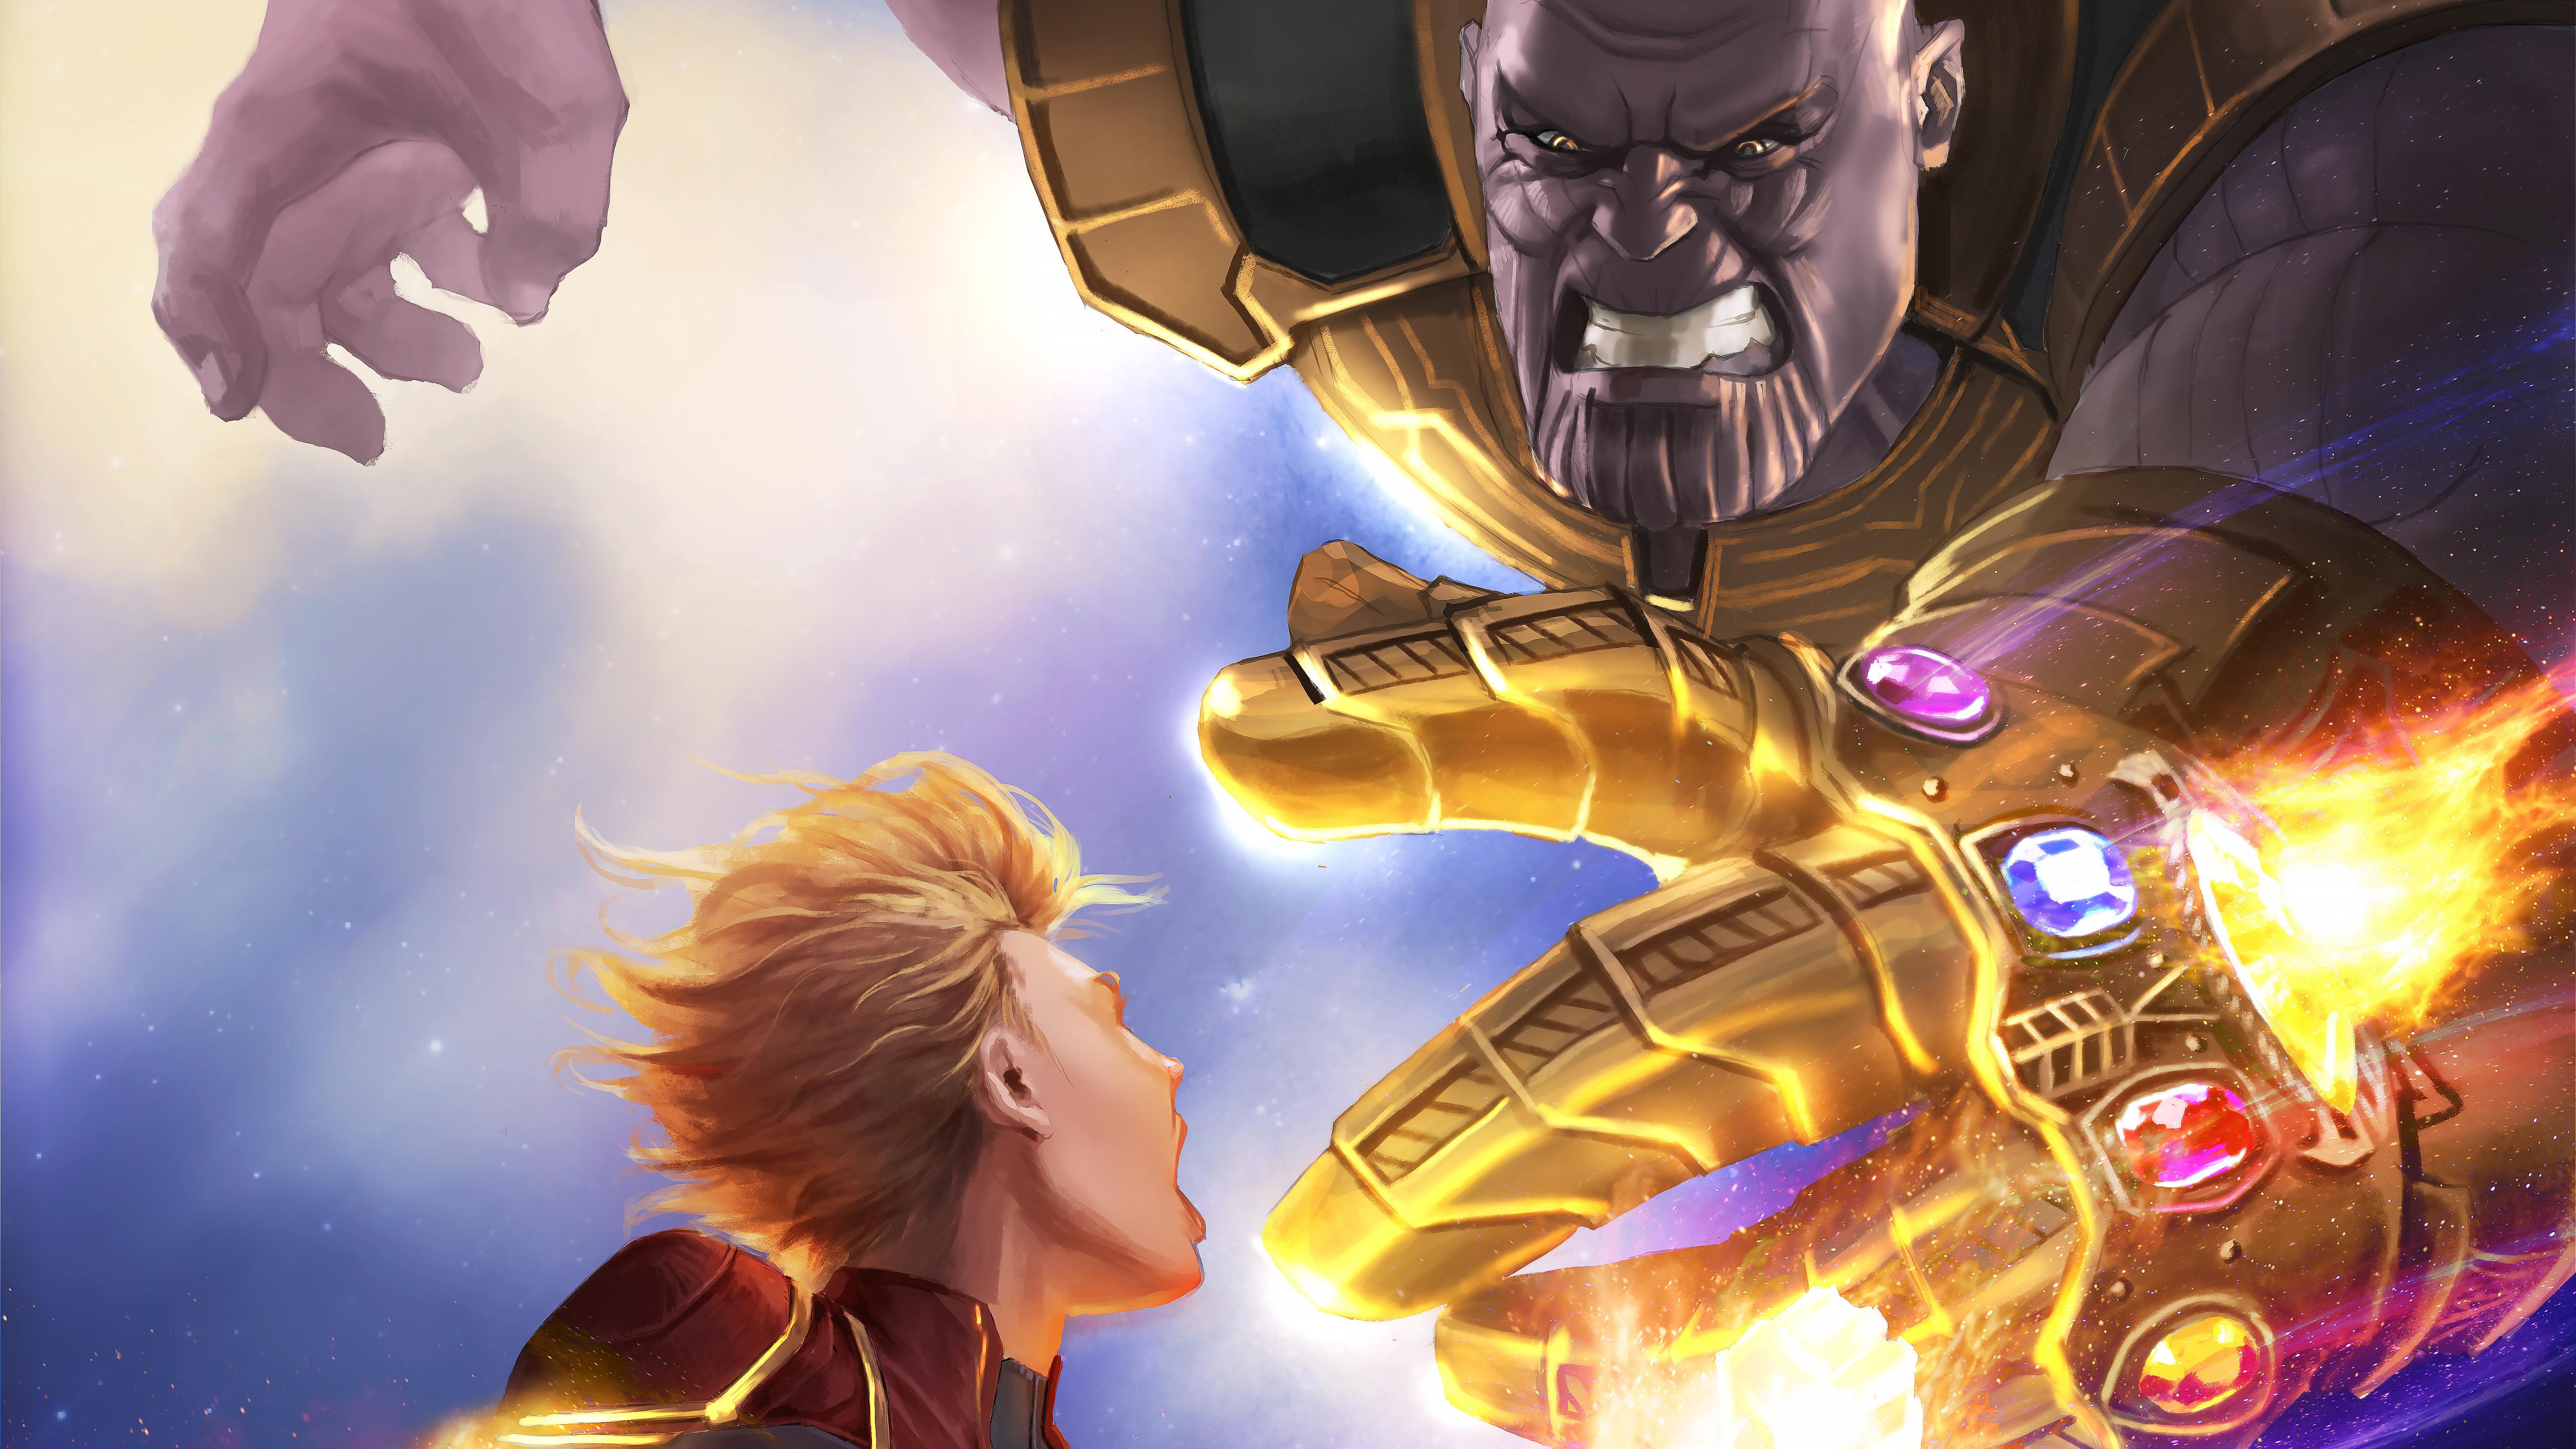 Captain Marvel Vs Thanos 5k Artwork, HD Superheroes, 4k ...